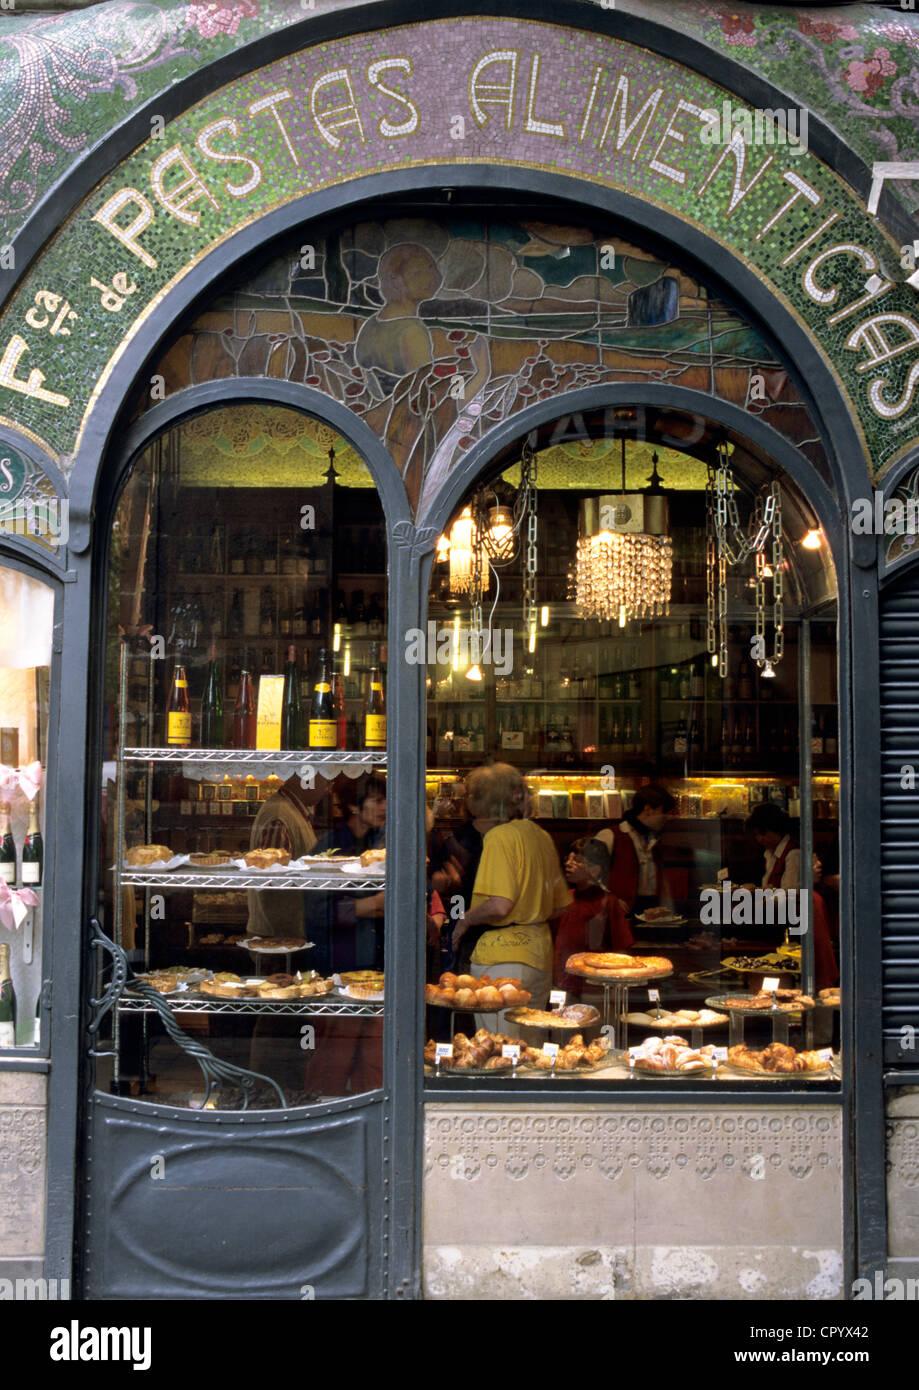 Spain catalonia barcelona las ramblas escriba cake shop and chocolate stock photo royalty free - Tea shop barcelona ...